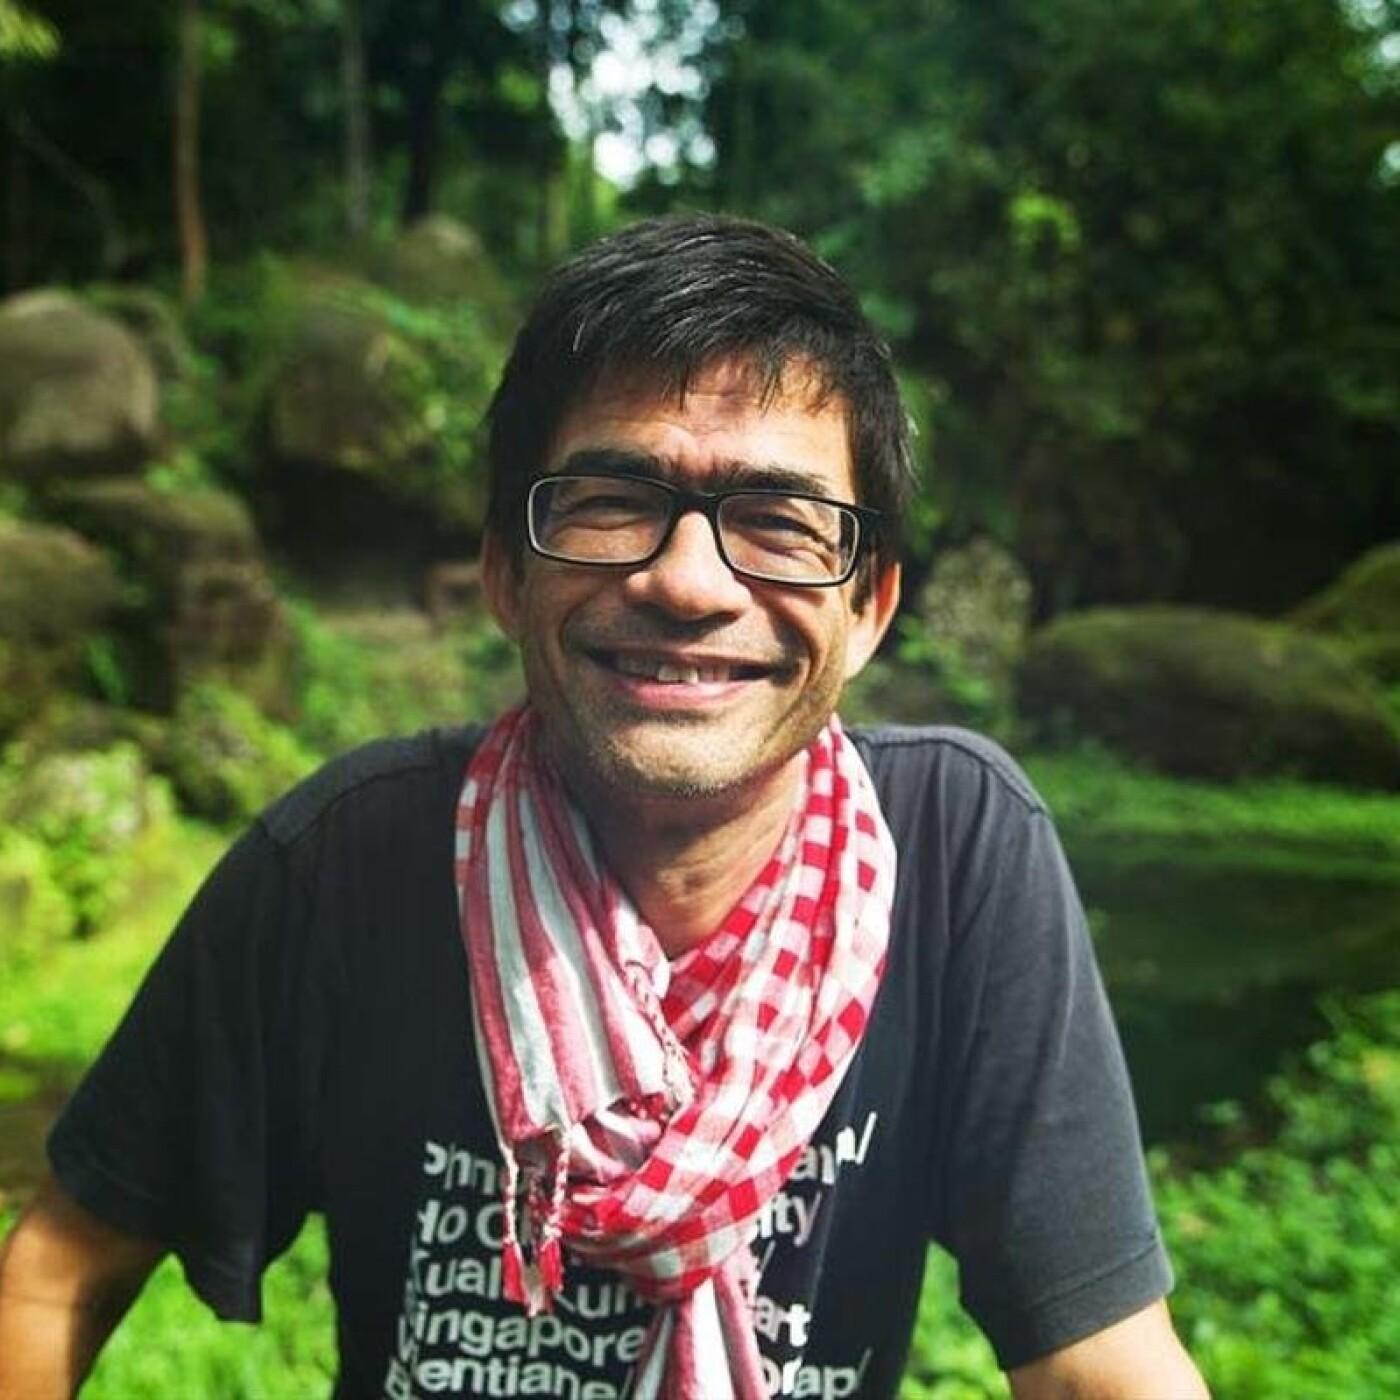 Laurent parle de sa passion pour le Cambodge - 06 05 2021 - StereoChic Radio